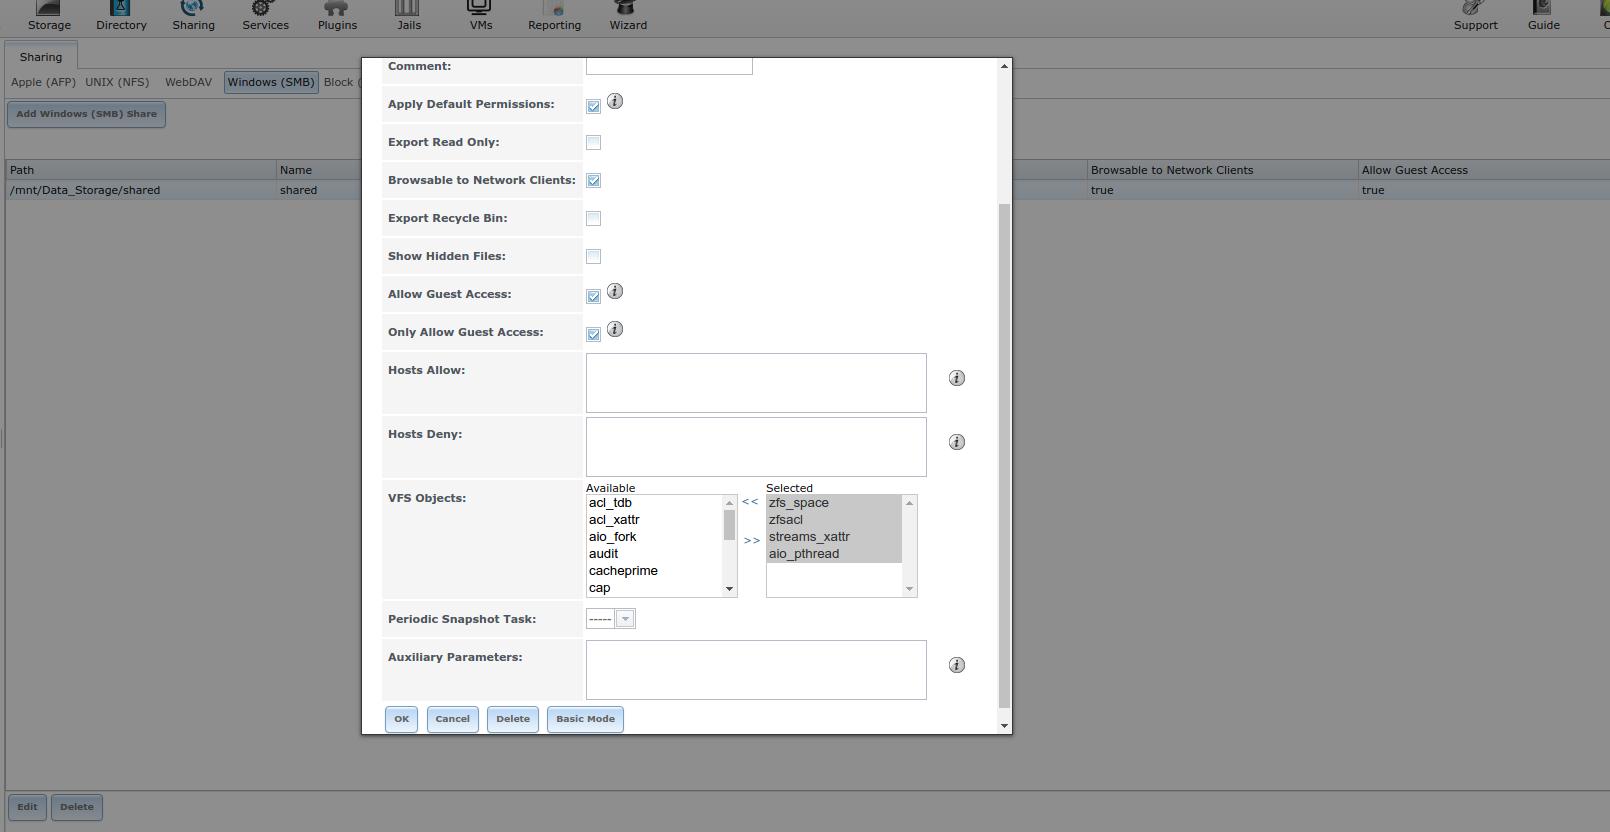 smb guest access - v 11 | iXsystems Community